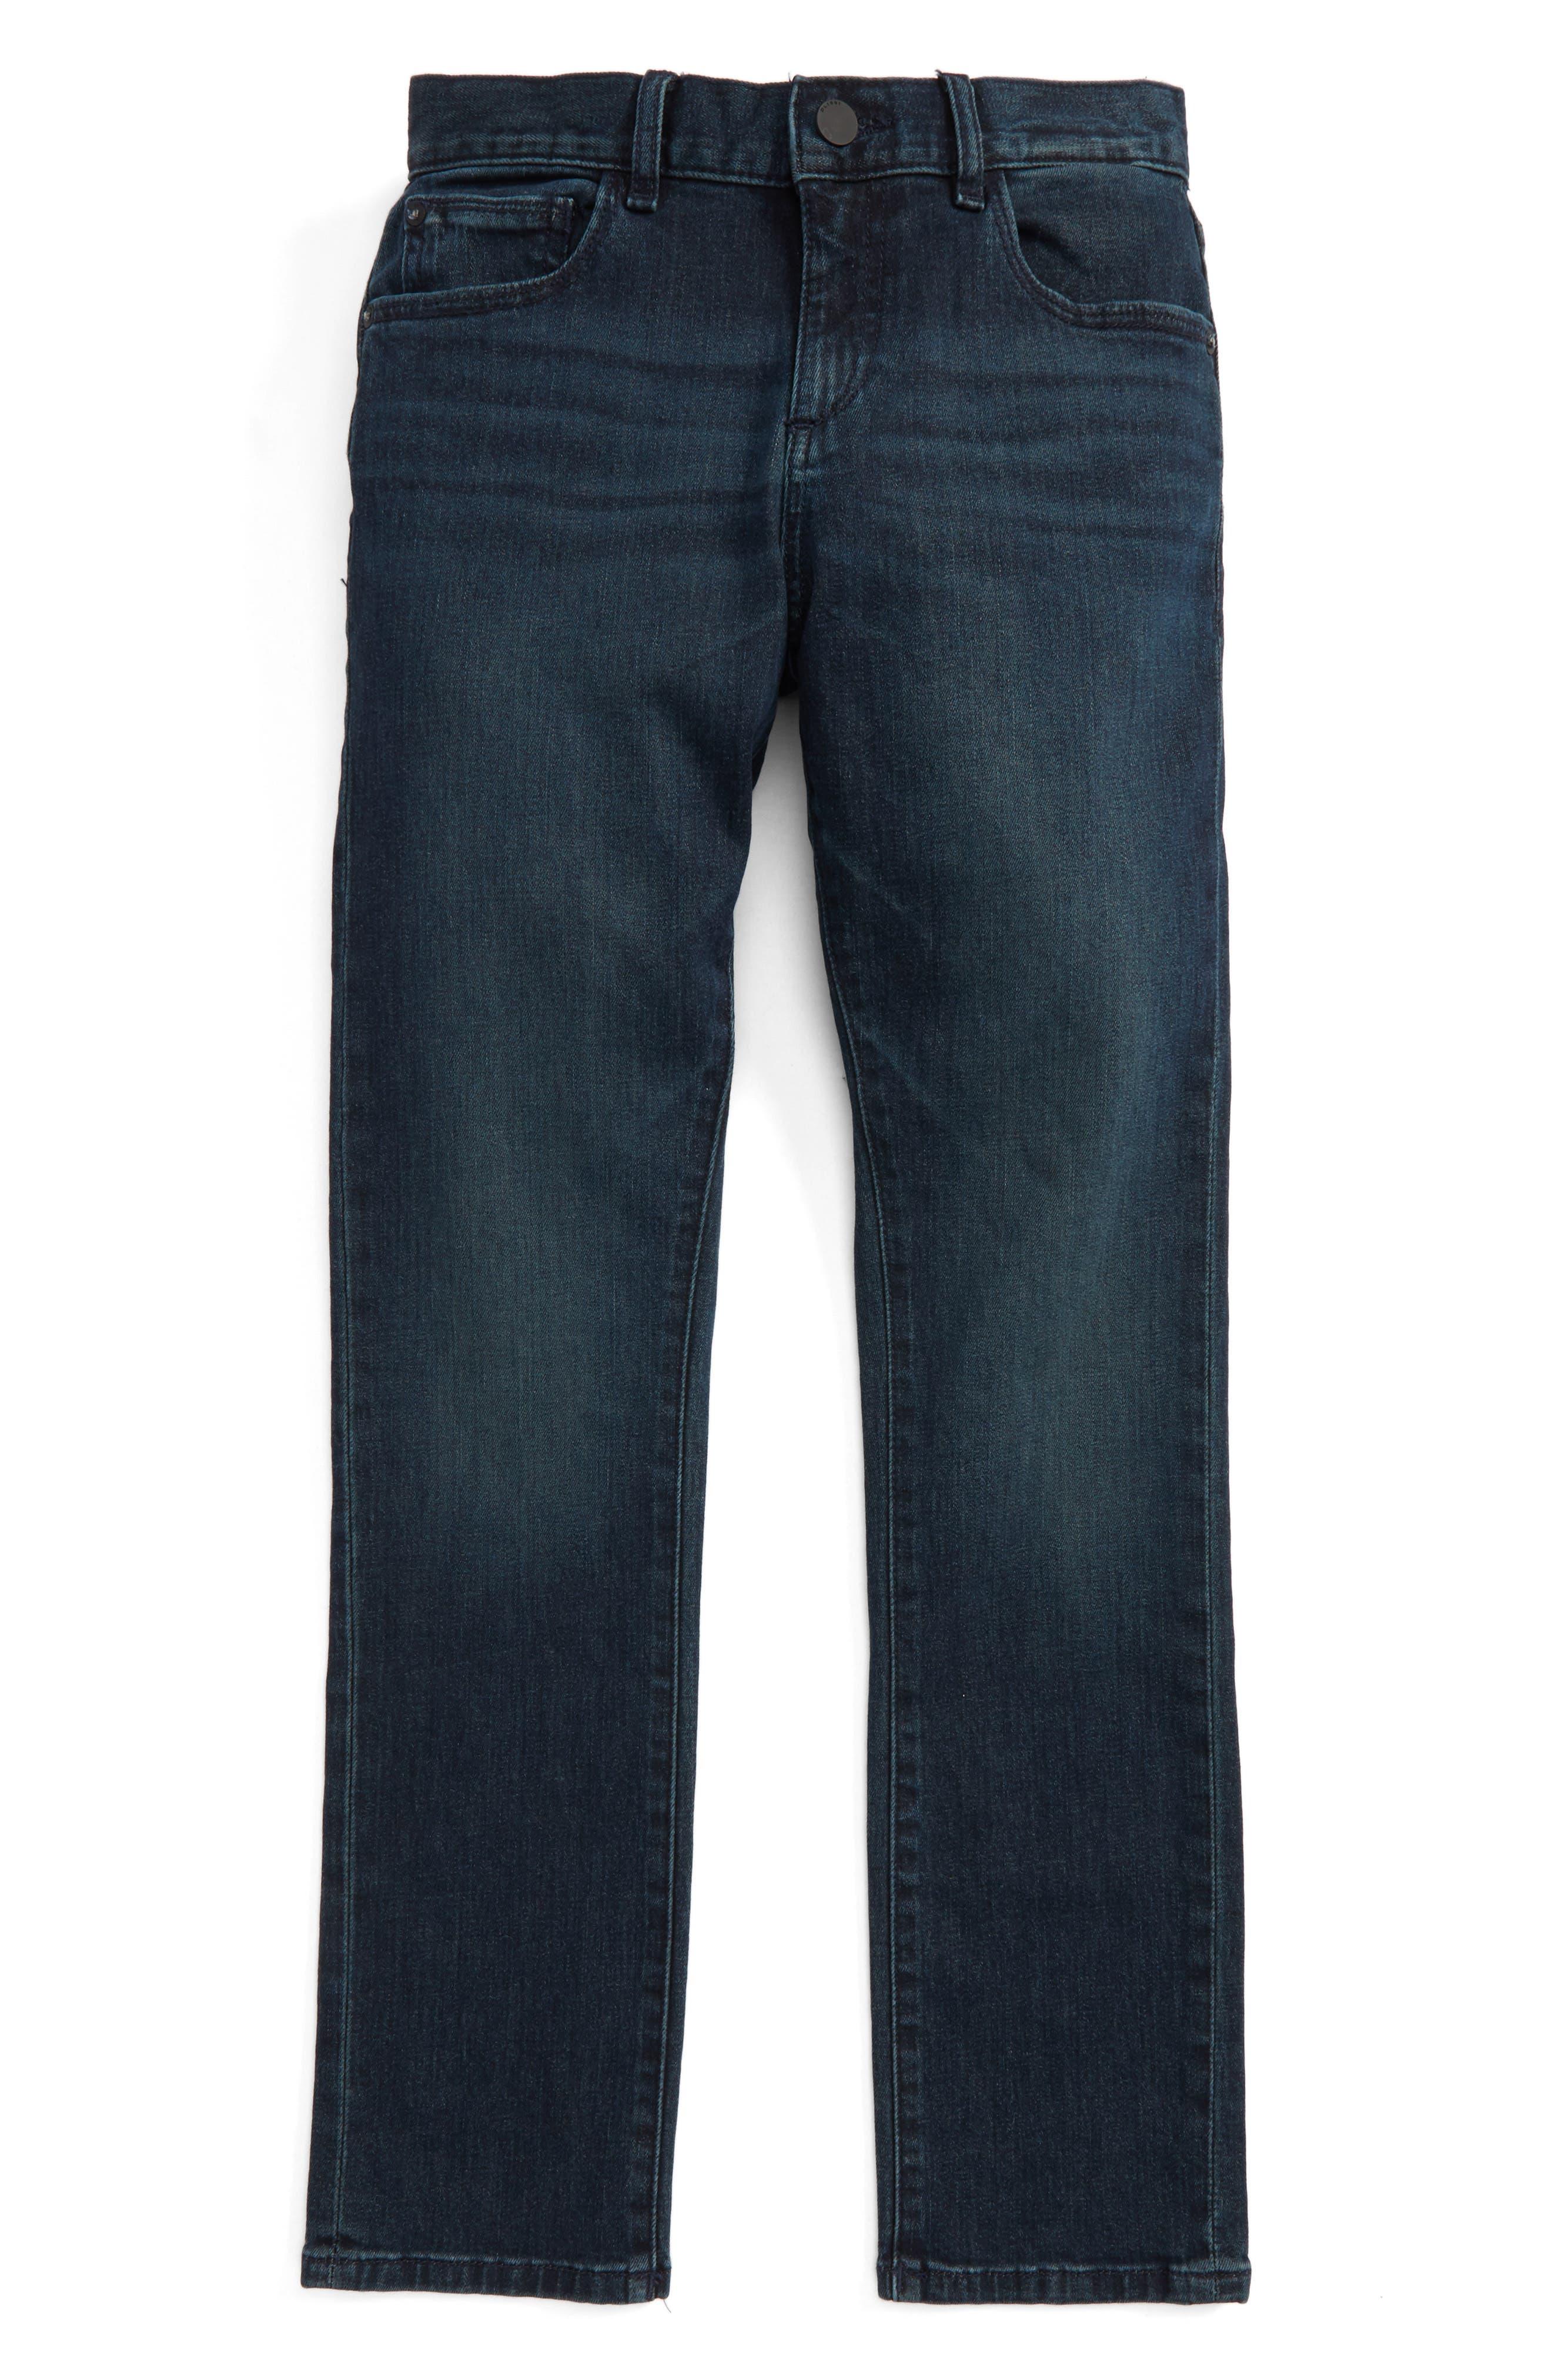 Main Image - DL1961 Brady Slim Fit Jeans (Big Boys)